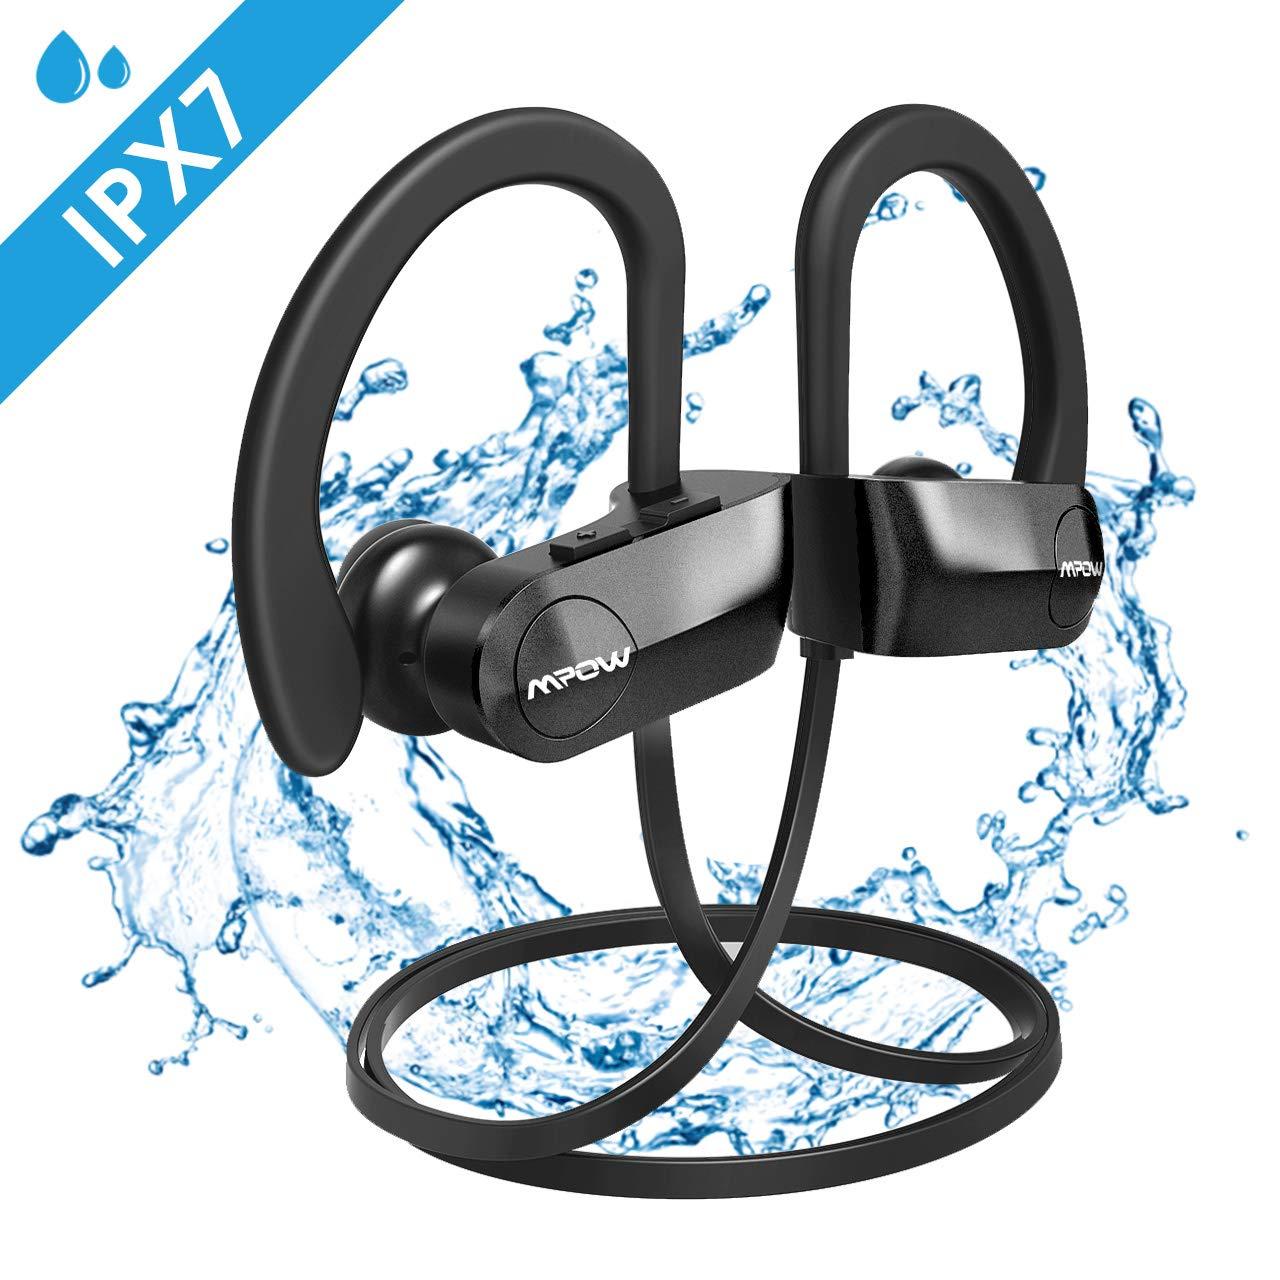 Letsfit Bluetooth Kopfh/örer Kabellose Sport Kopfh/örer IPX7 Wasserdicht In Ear Headset mit Mikrofon CVC 6.0 Stereo Sound 8 Stunden Spielzeit f/ür Fitness Pink MEHRWEG